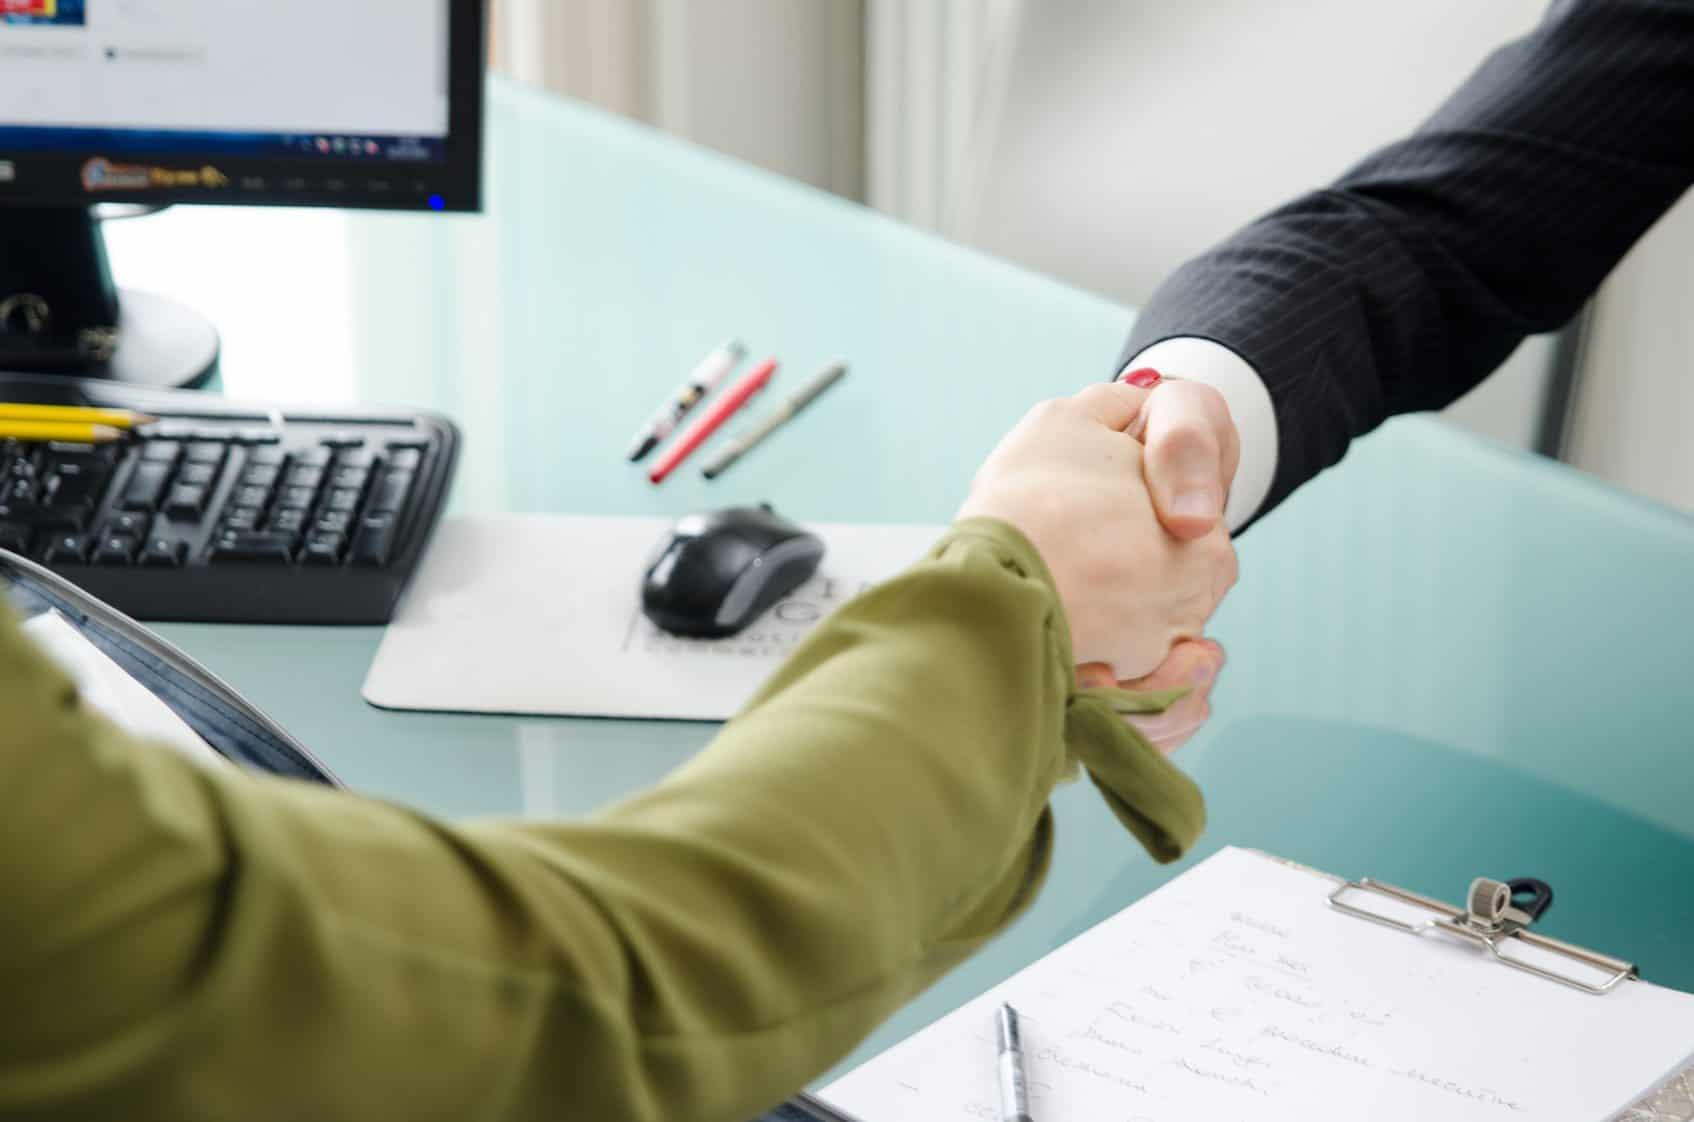 negotiating credit card processing fees